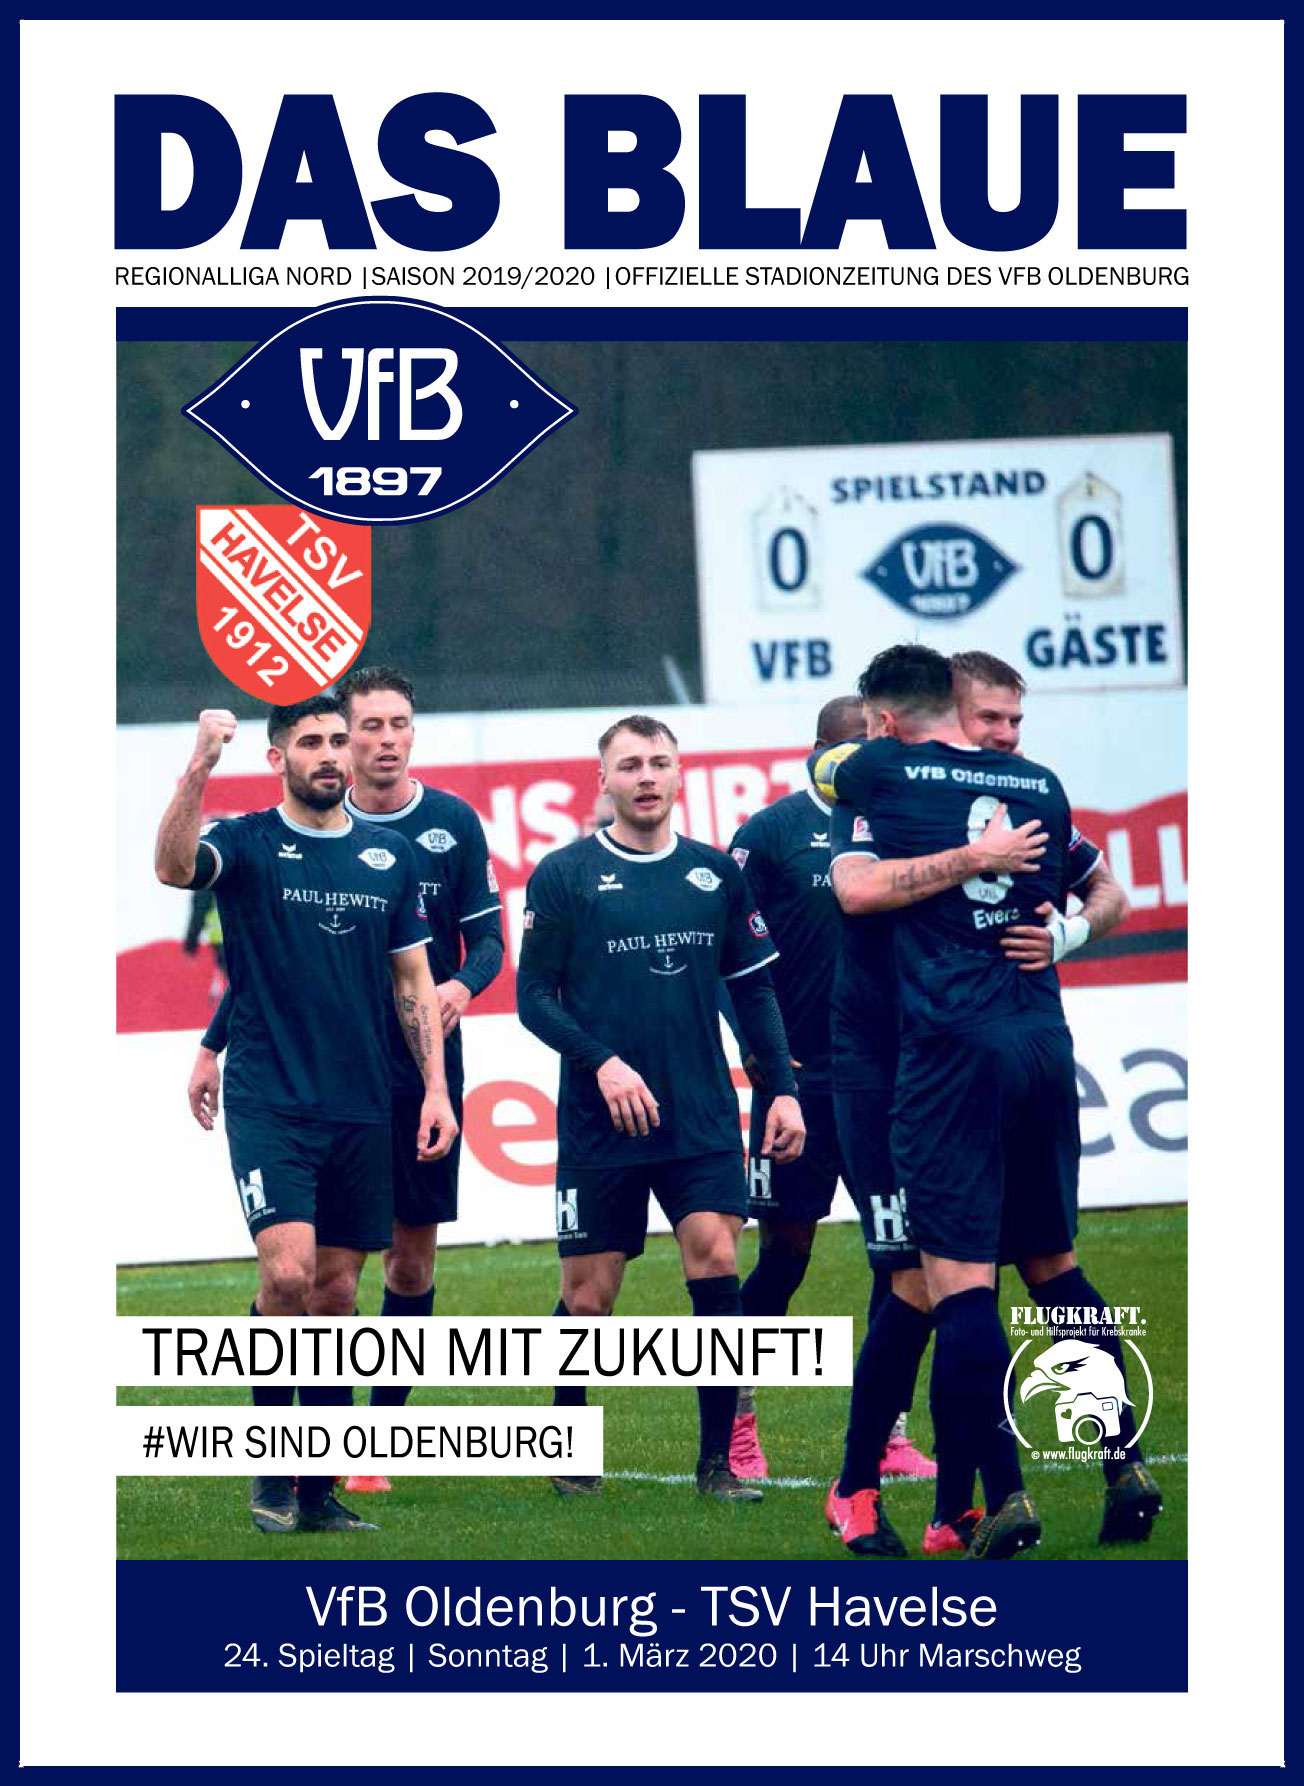 https://vfb-oldenburg.de/wp-content/uploads/VFB_Oldenburg_24_Spieltag_2019_2020-1.jpg